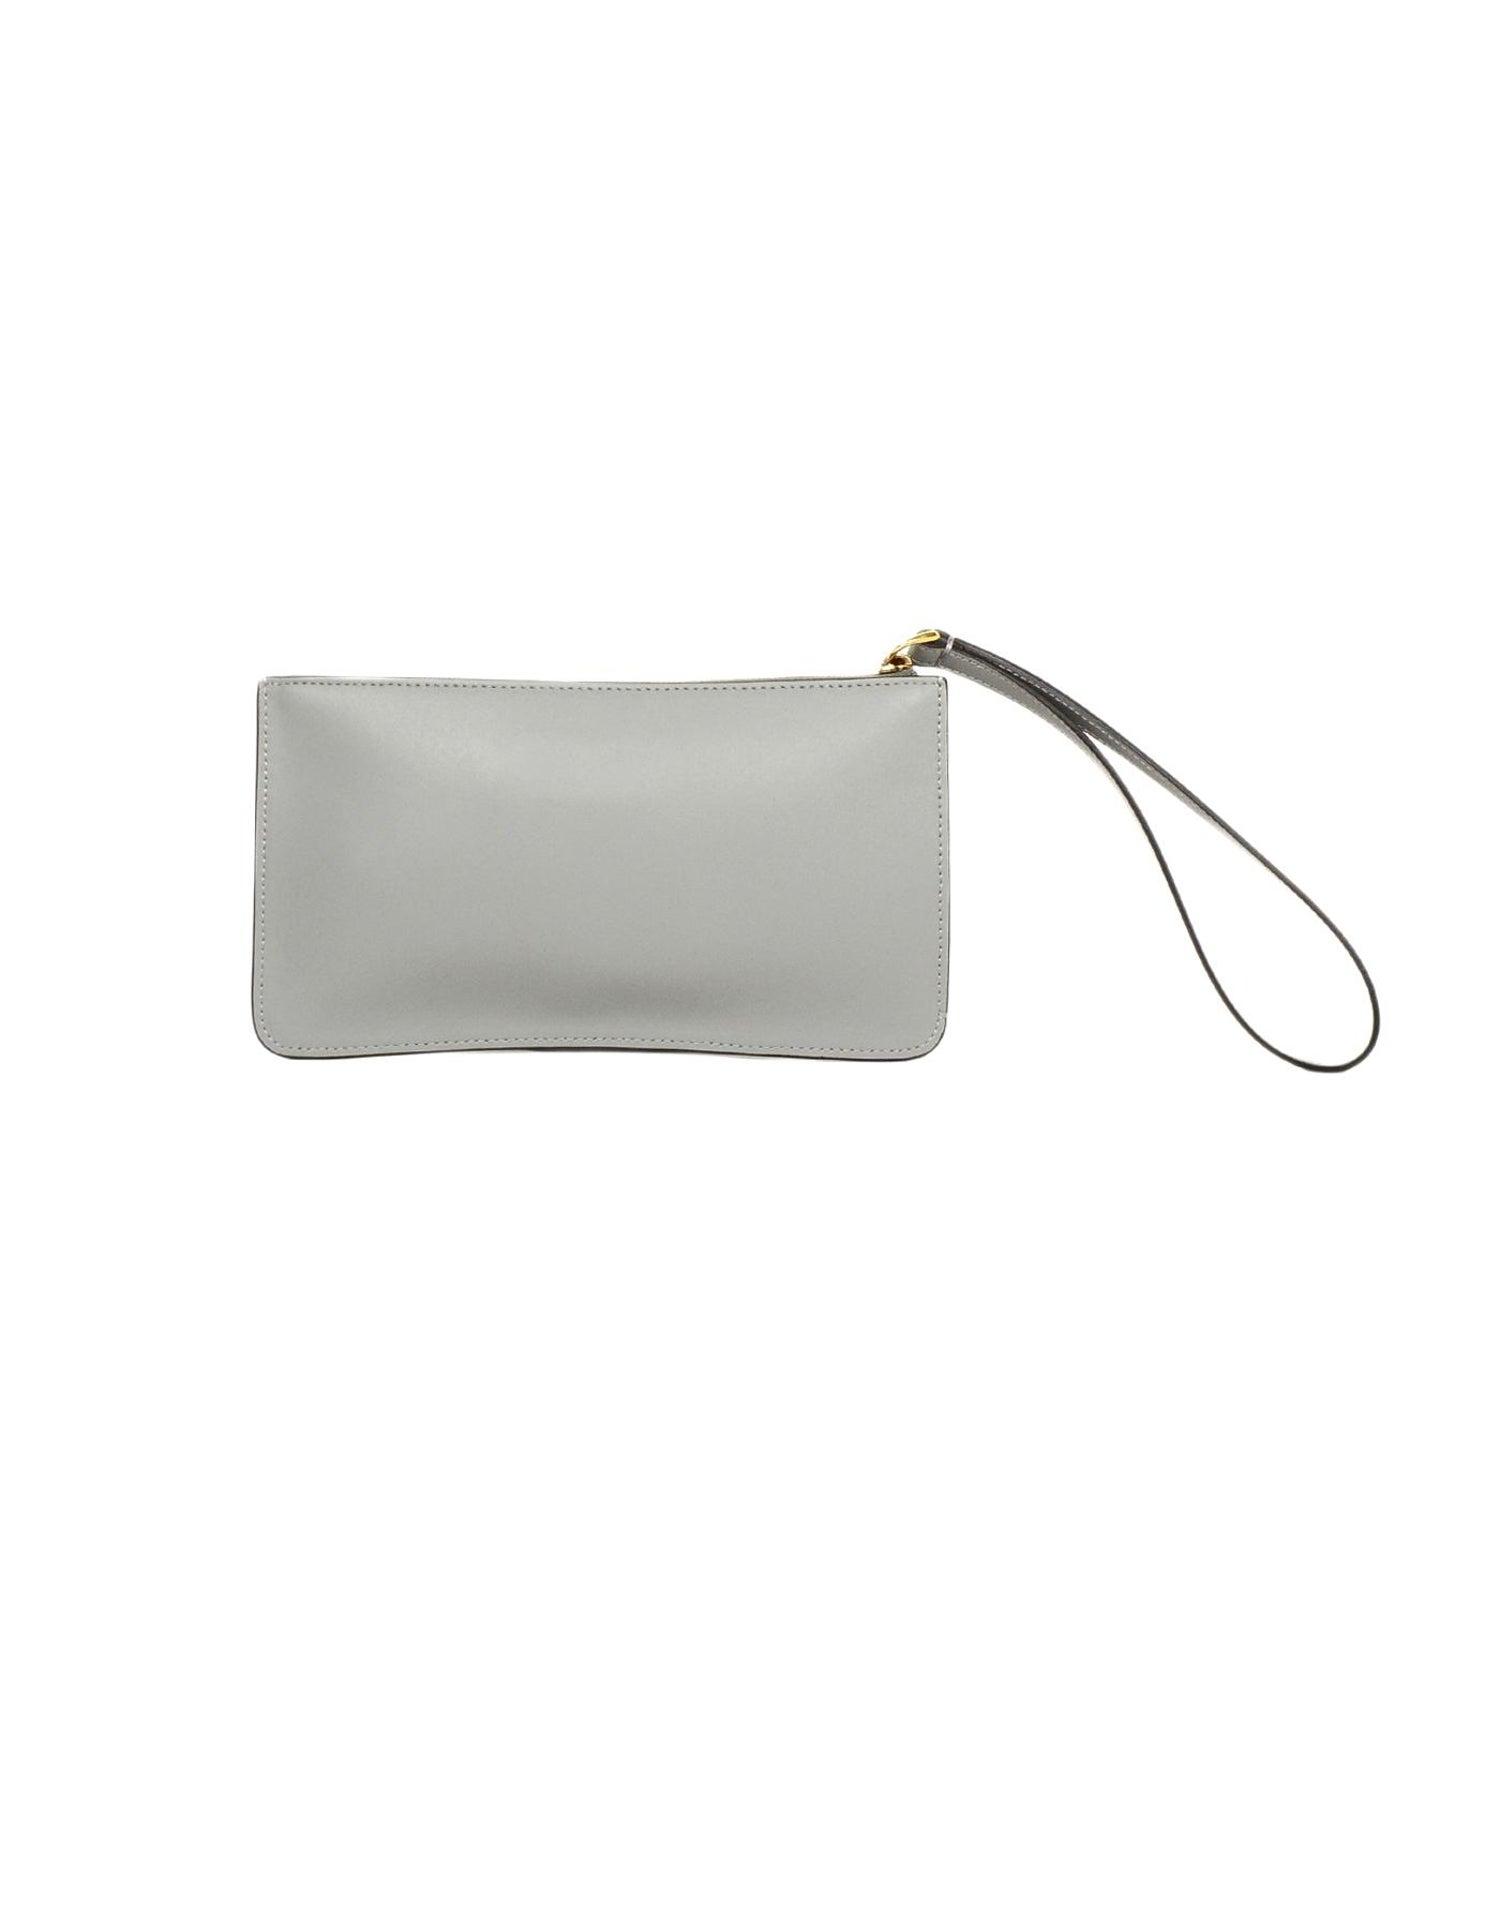 92eb50c0bb24 Fendi Grey Leather Multicolor Studded Liberty Wristlet Bag For Sale at  1stdibs